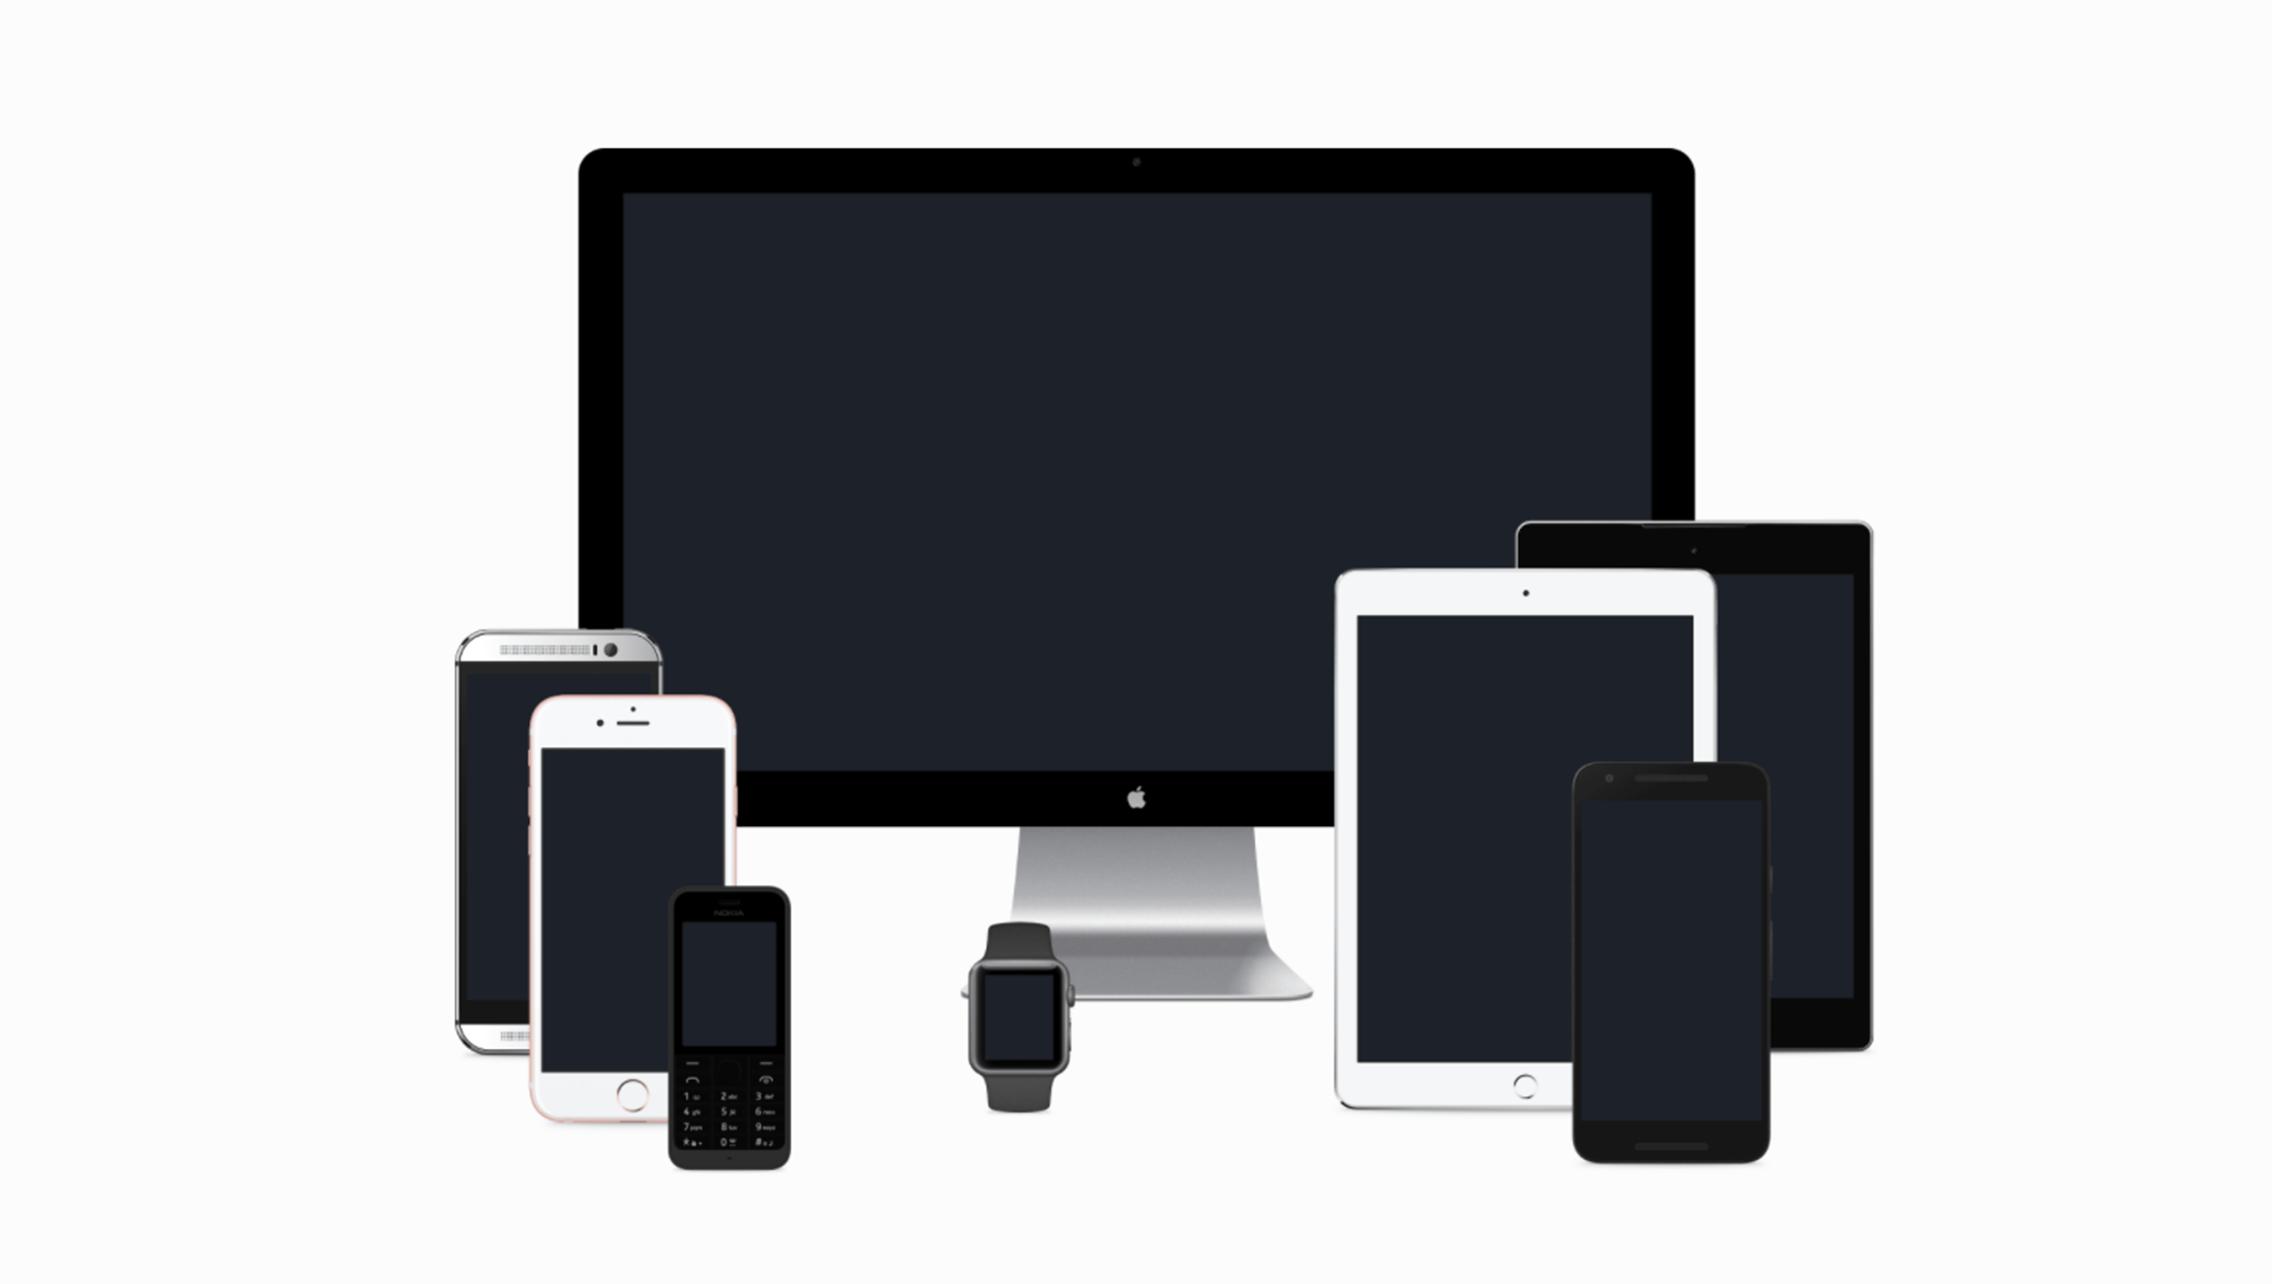 jacob-ruiz-design-blog-tools-facebook-devices